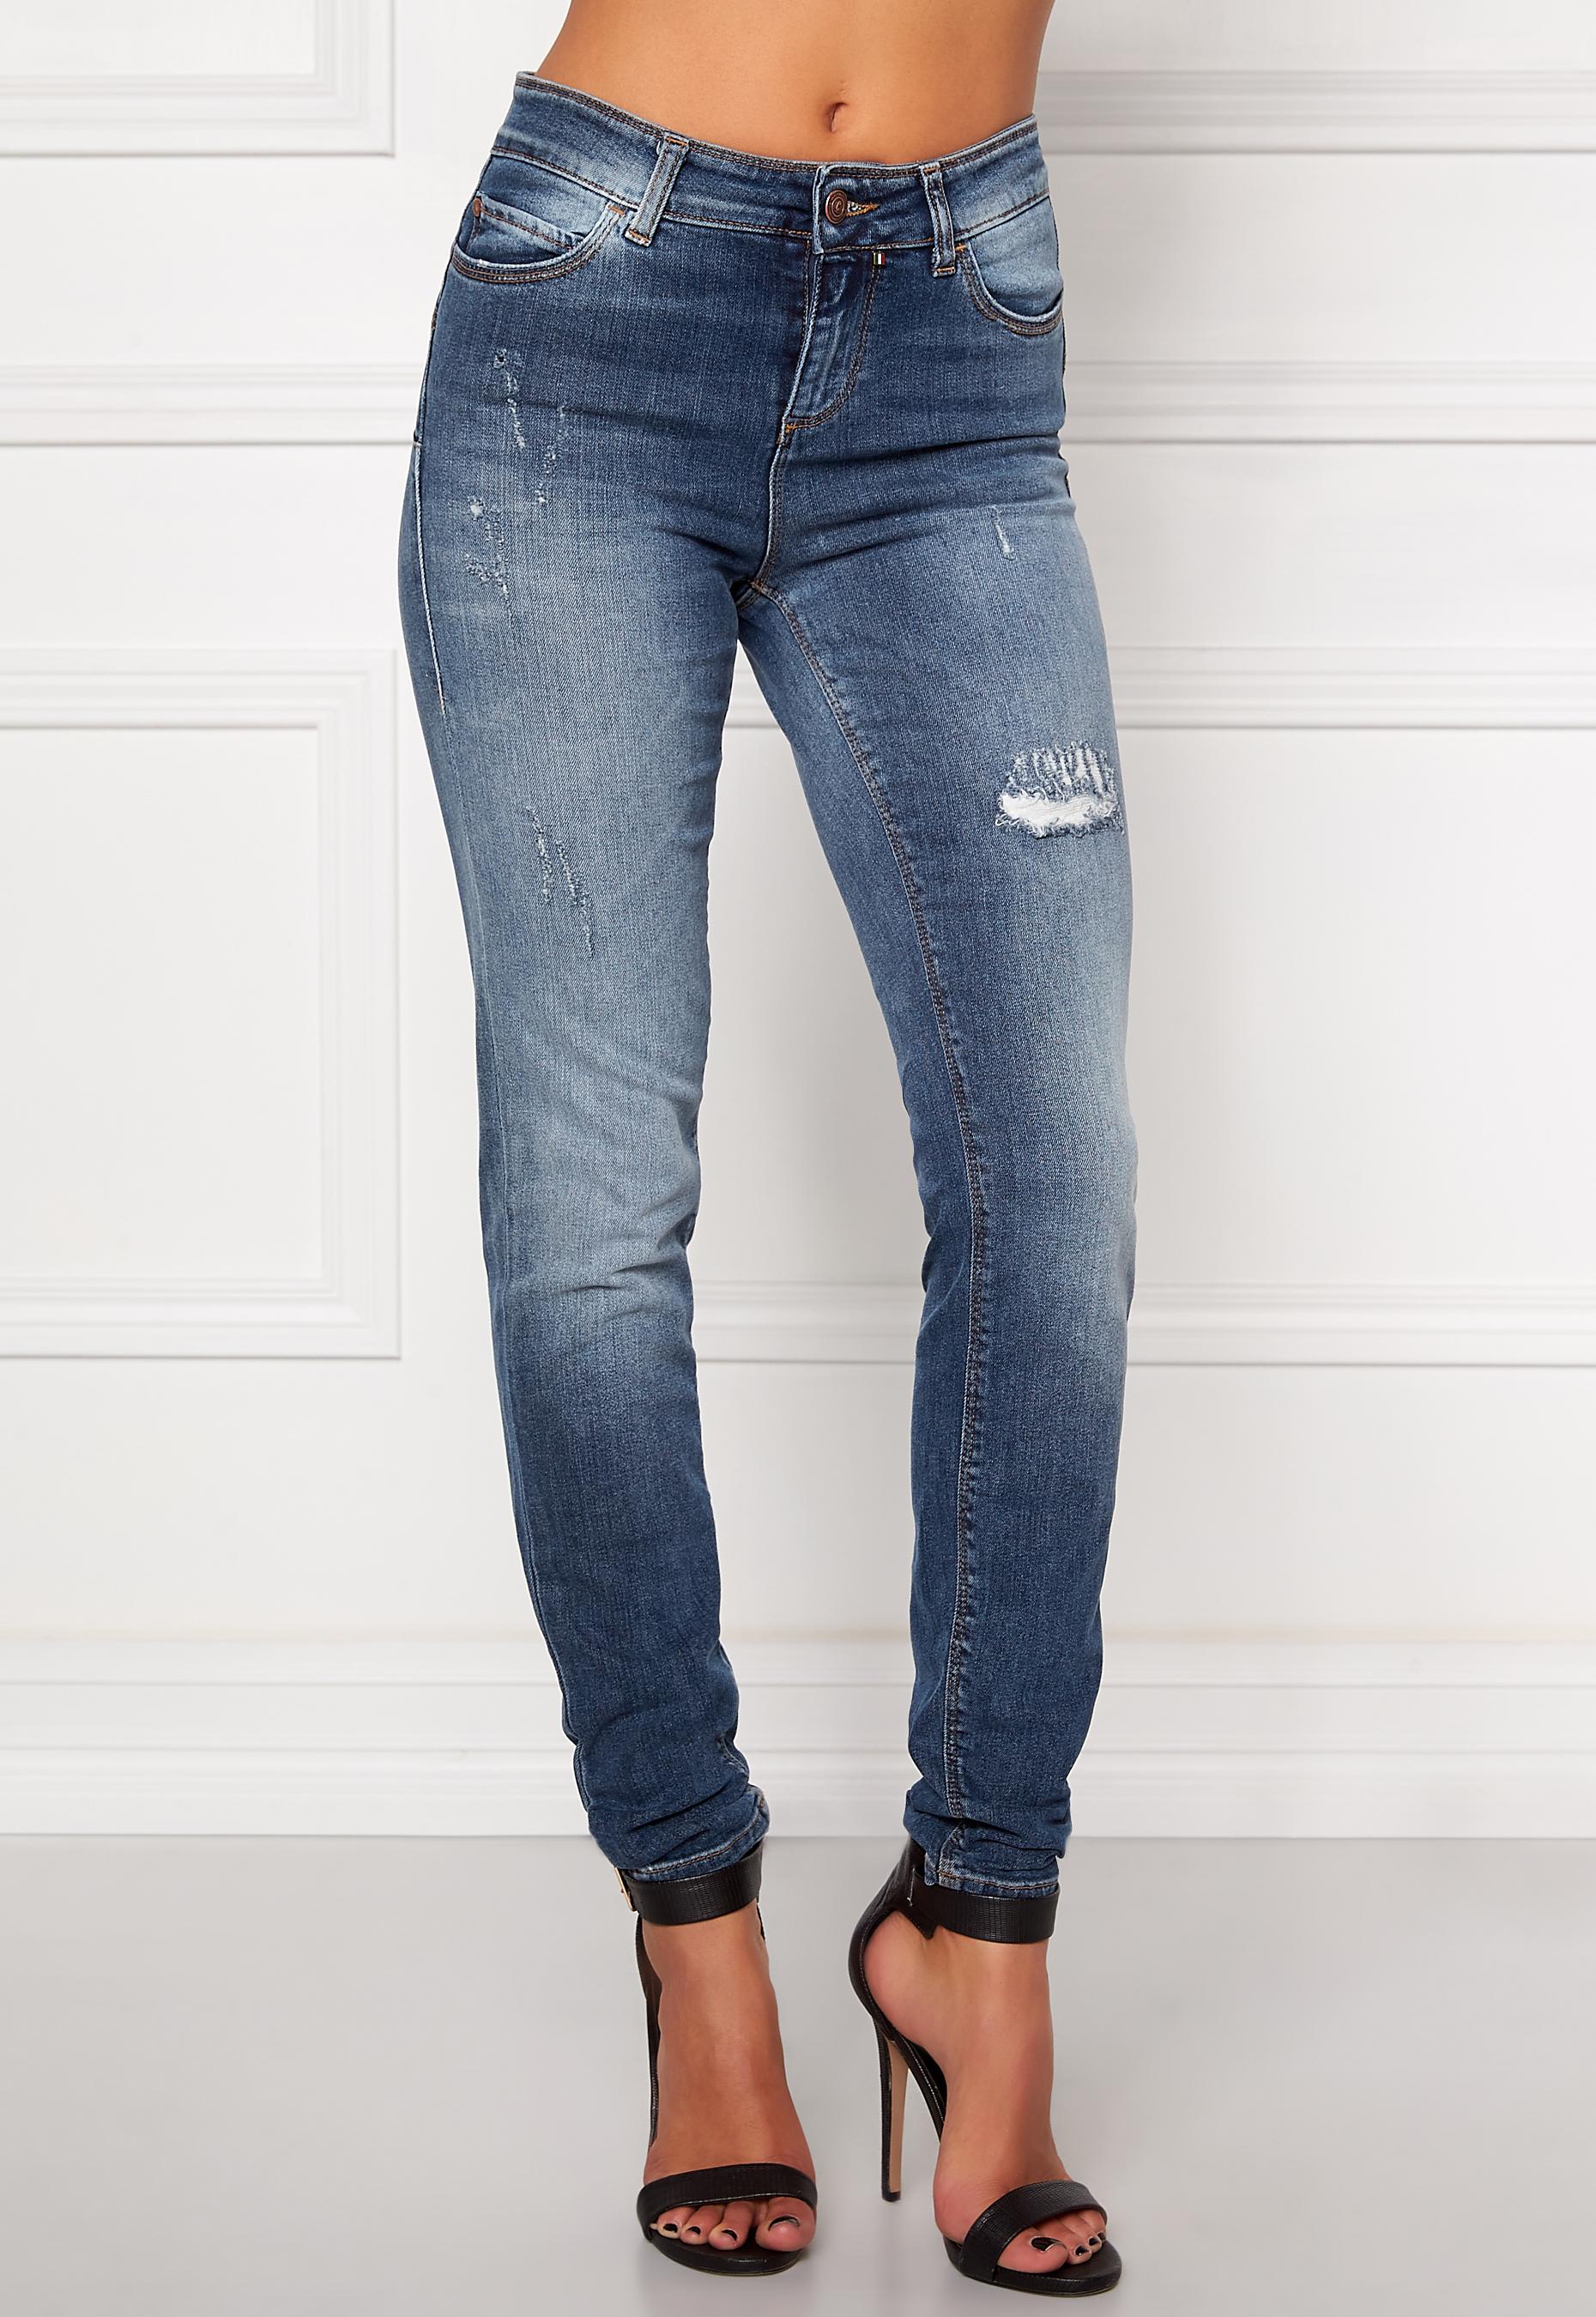 Dark Bubbleroom Sally Denim 462 Skinny Object Jeans Blue 0xIPRfnwq